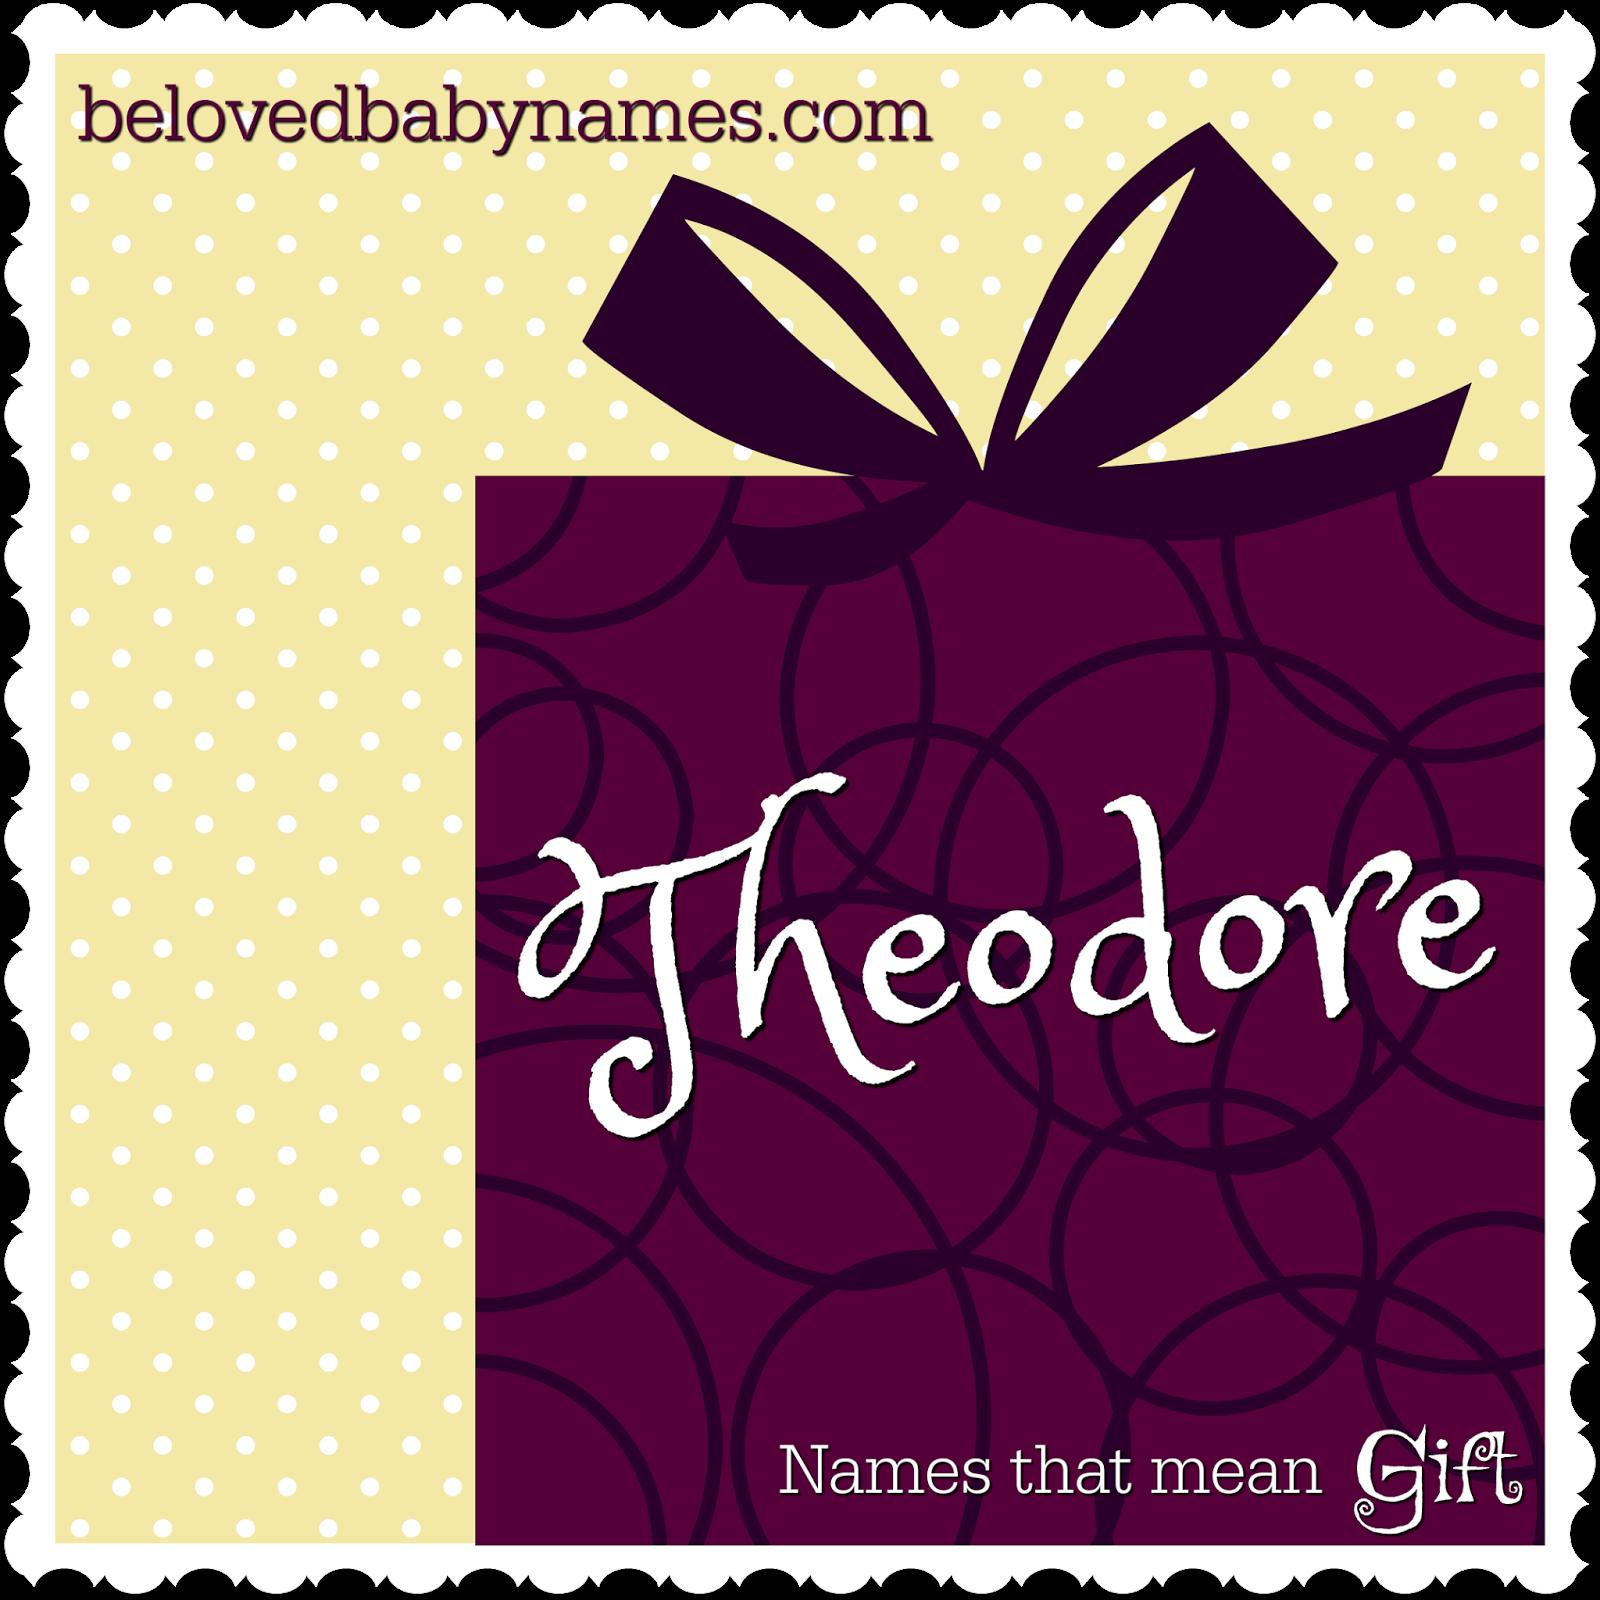 Beloved Baby Names: 21 Wonderful Names that Mean Gift